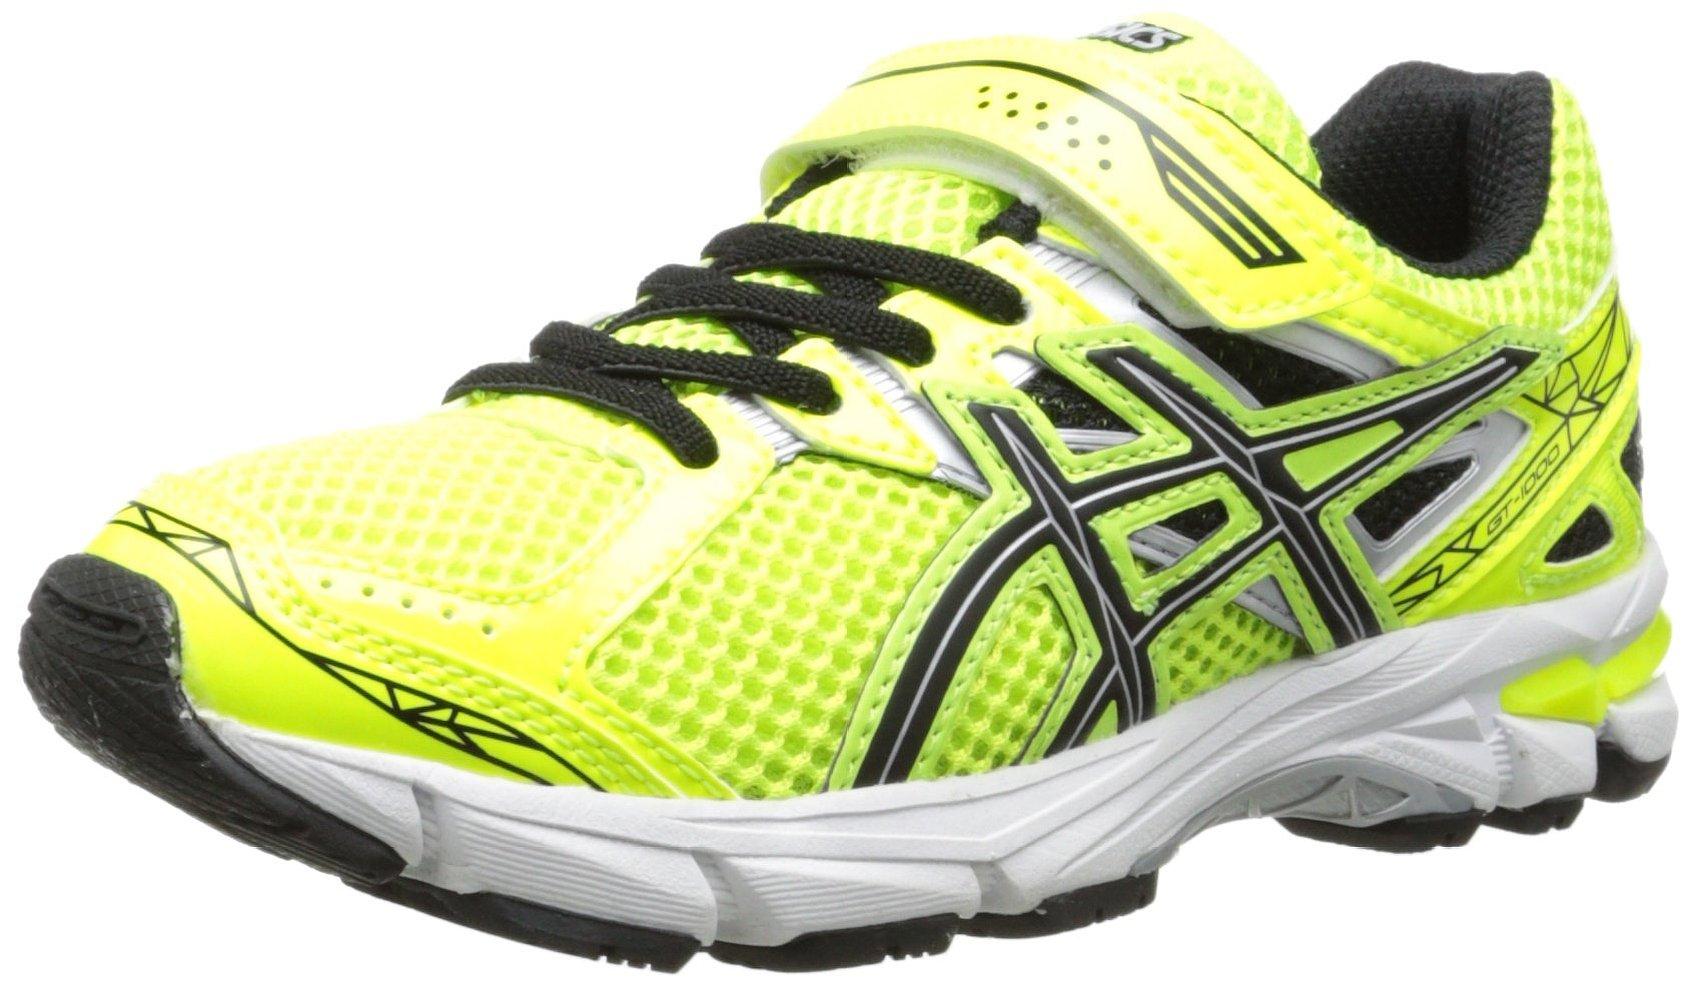 Asics 60% Off GT 1000 3 PS Running Shoe - Flash Yellow Black Lightning 8473e0e643